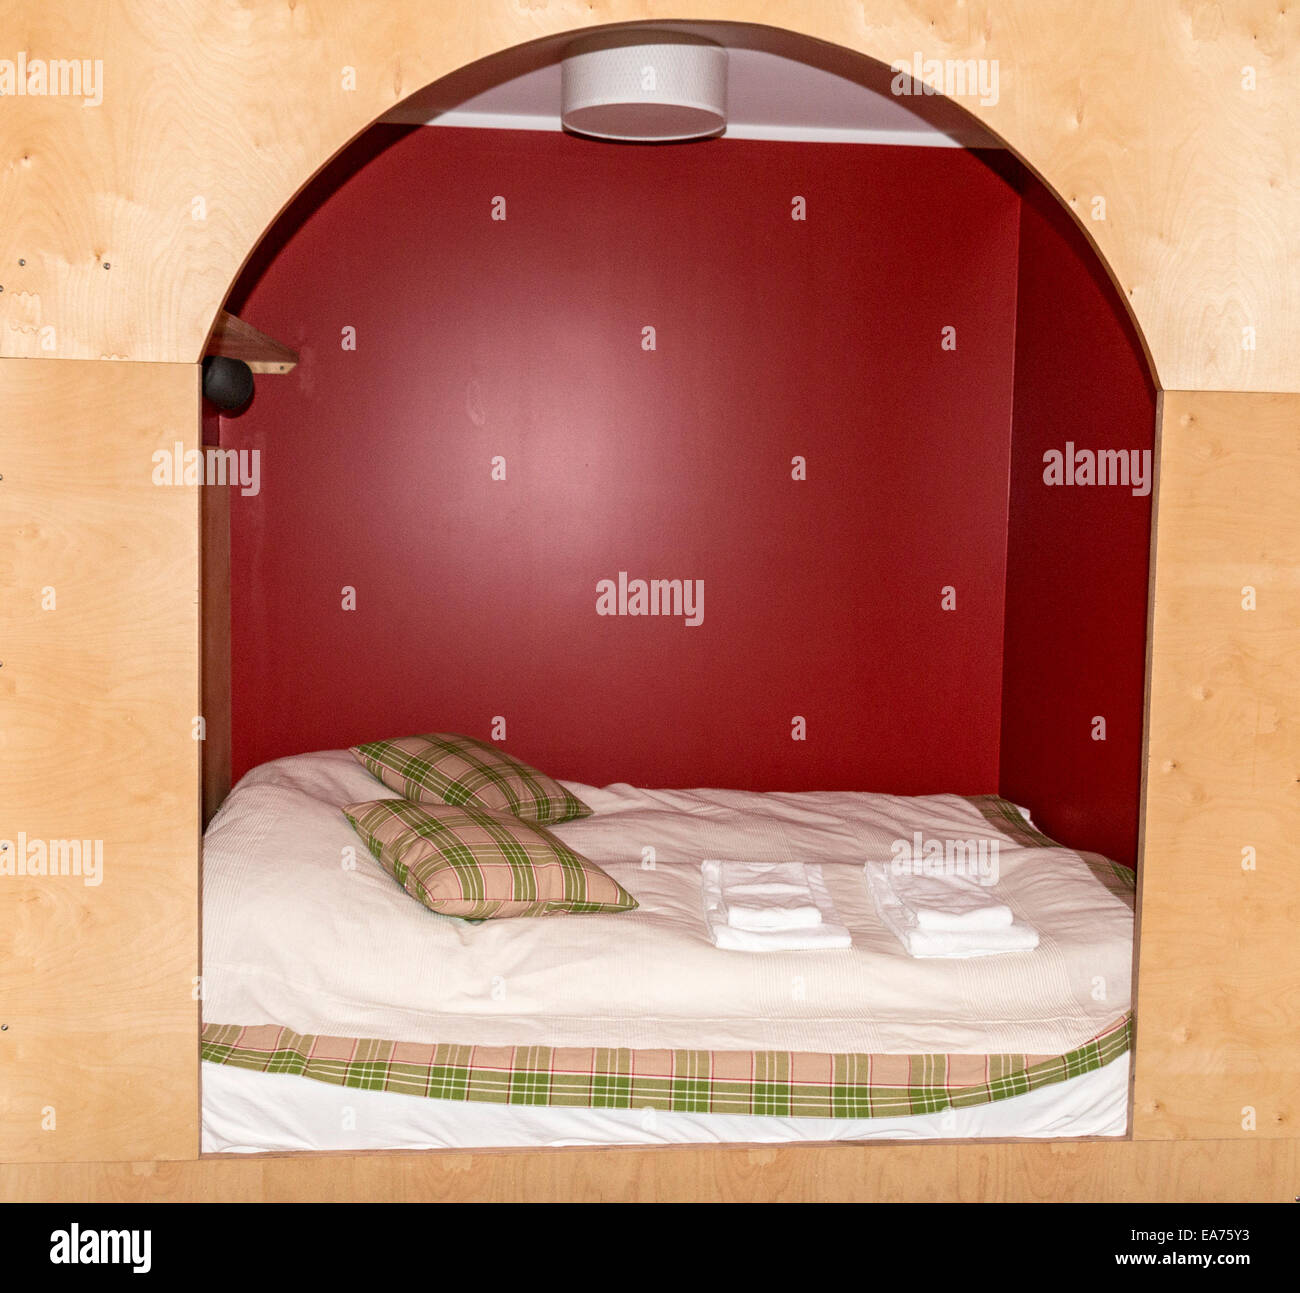 sey isfj r ur stockfotos sey isfj r ur bilder alamy. Black Bedroom Furniture Sets. Home Design Ideas